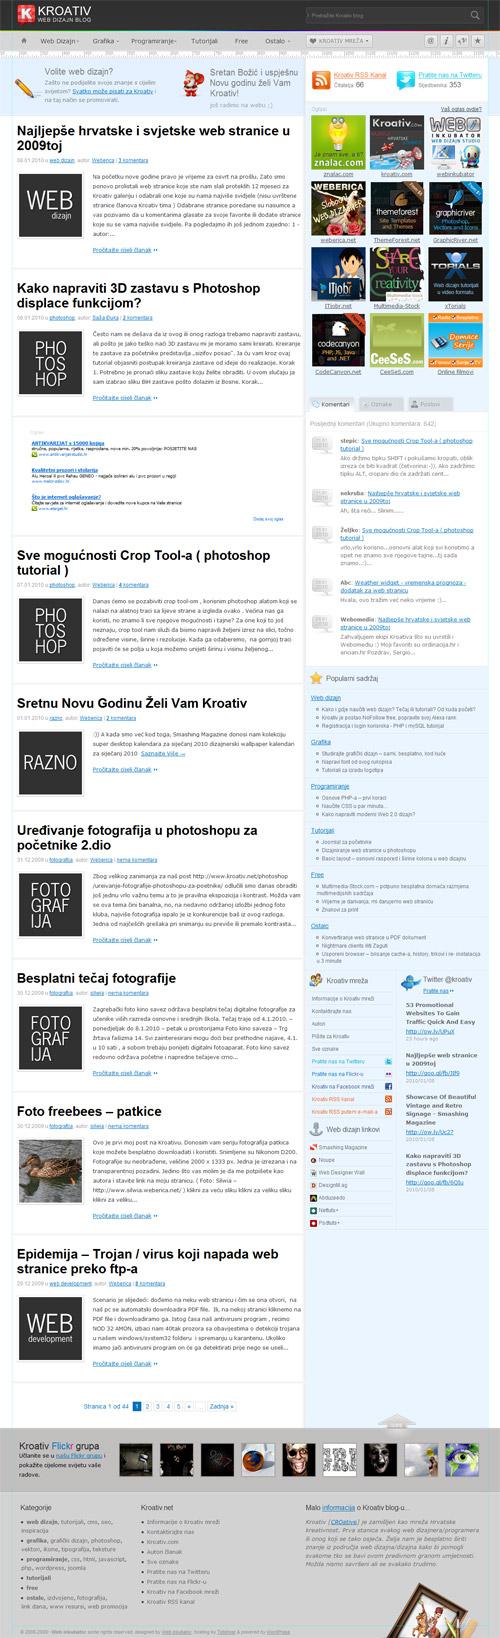 Kroativ web dizajn blog